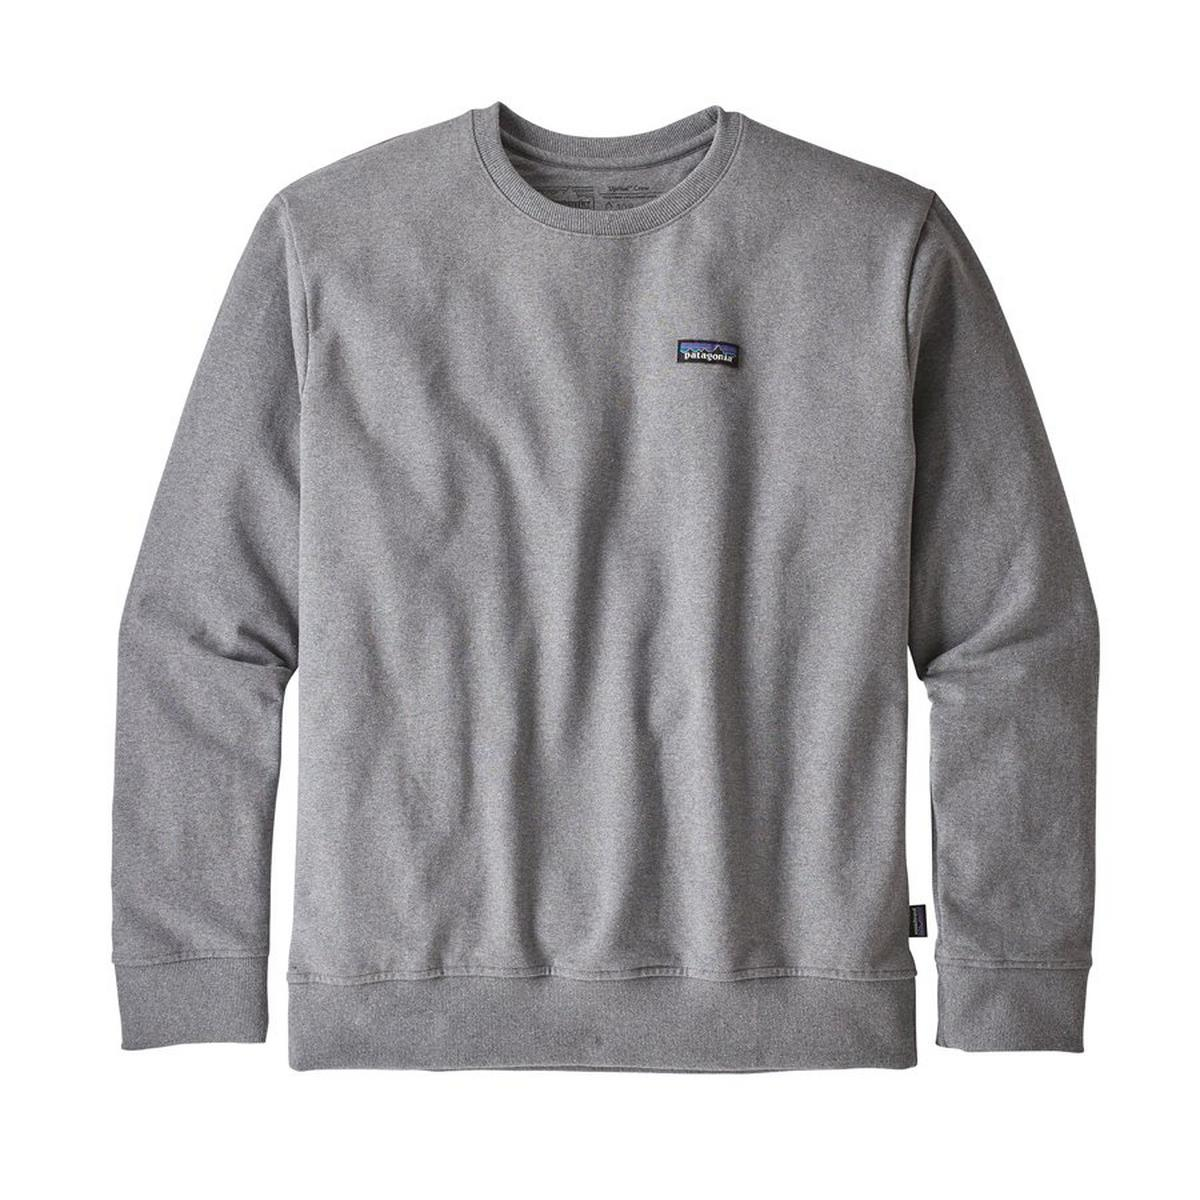 Patagonia Men's P6 Label Uprisal Crew - Grey